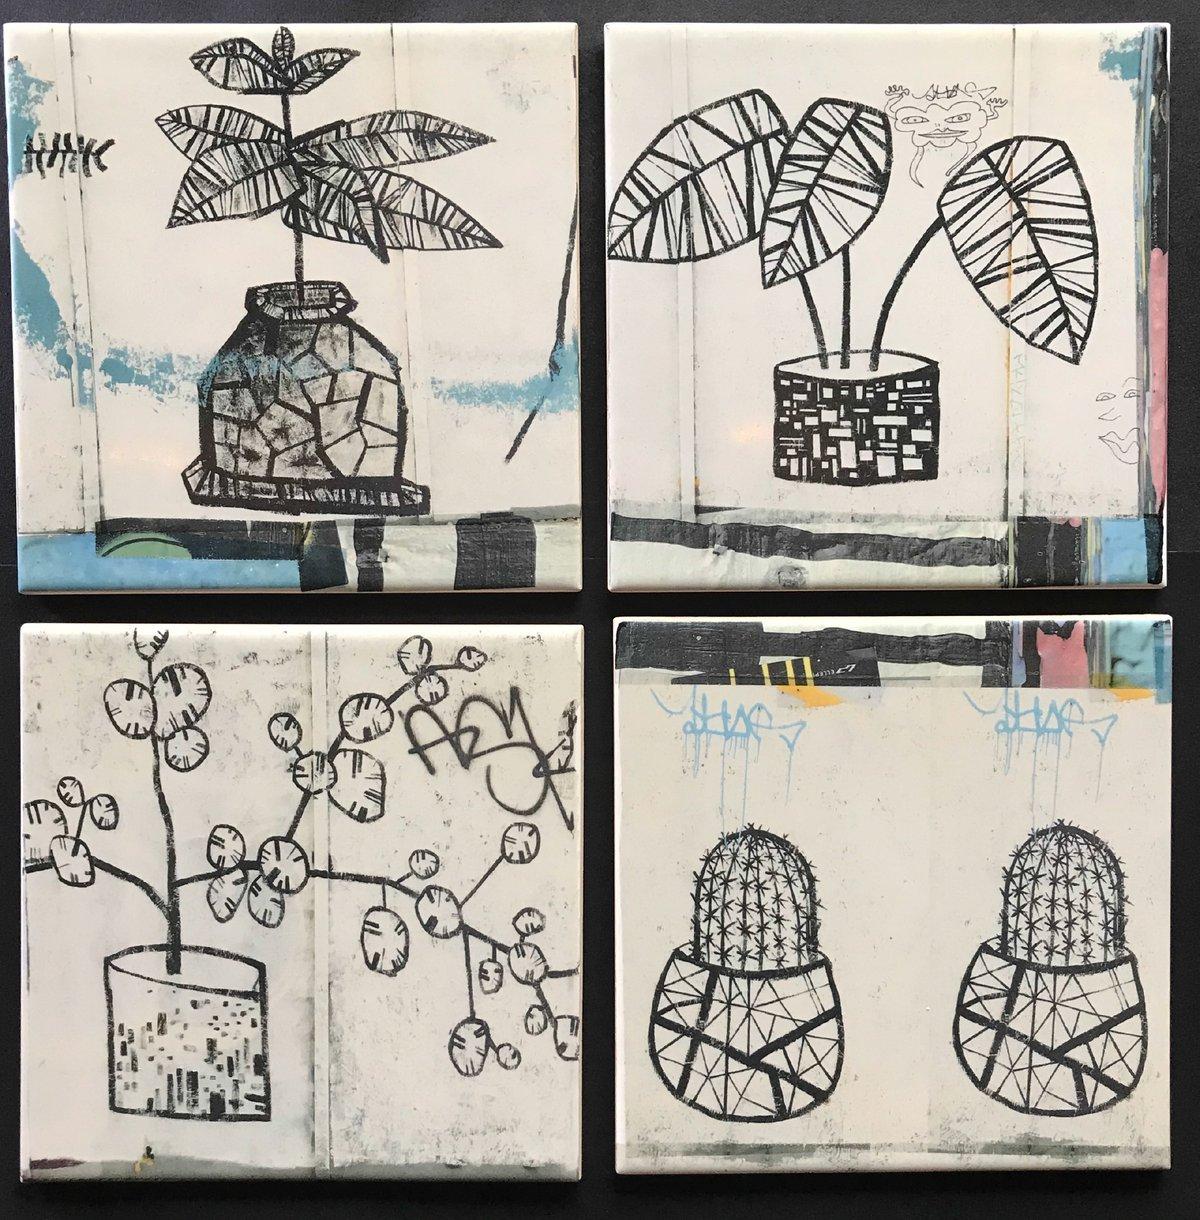 Black and white graffiti Tiles